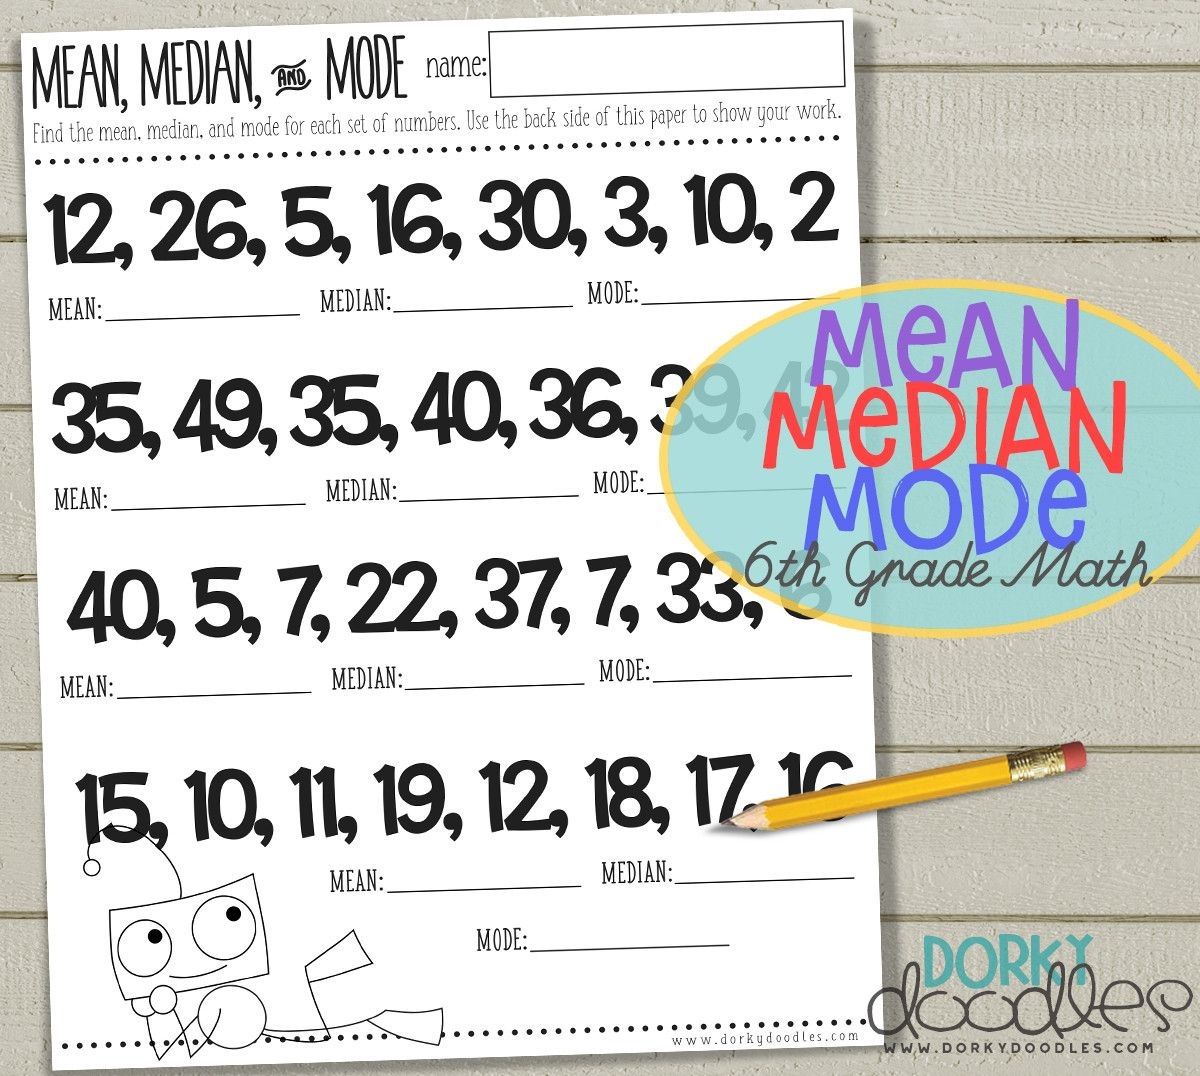 worksheet Mean Worksheet mean median mode printable 6th grade math worksheet educational worksheet